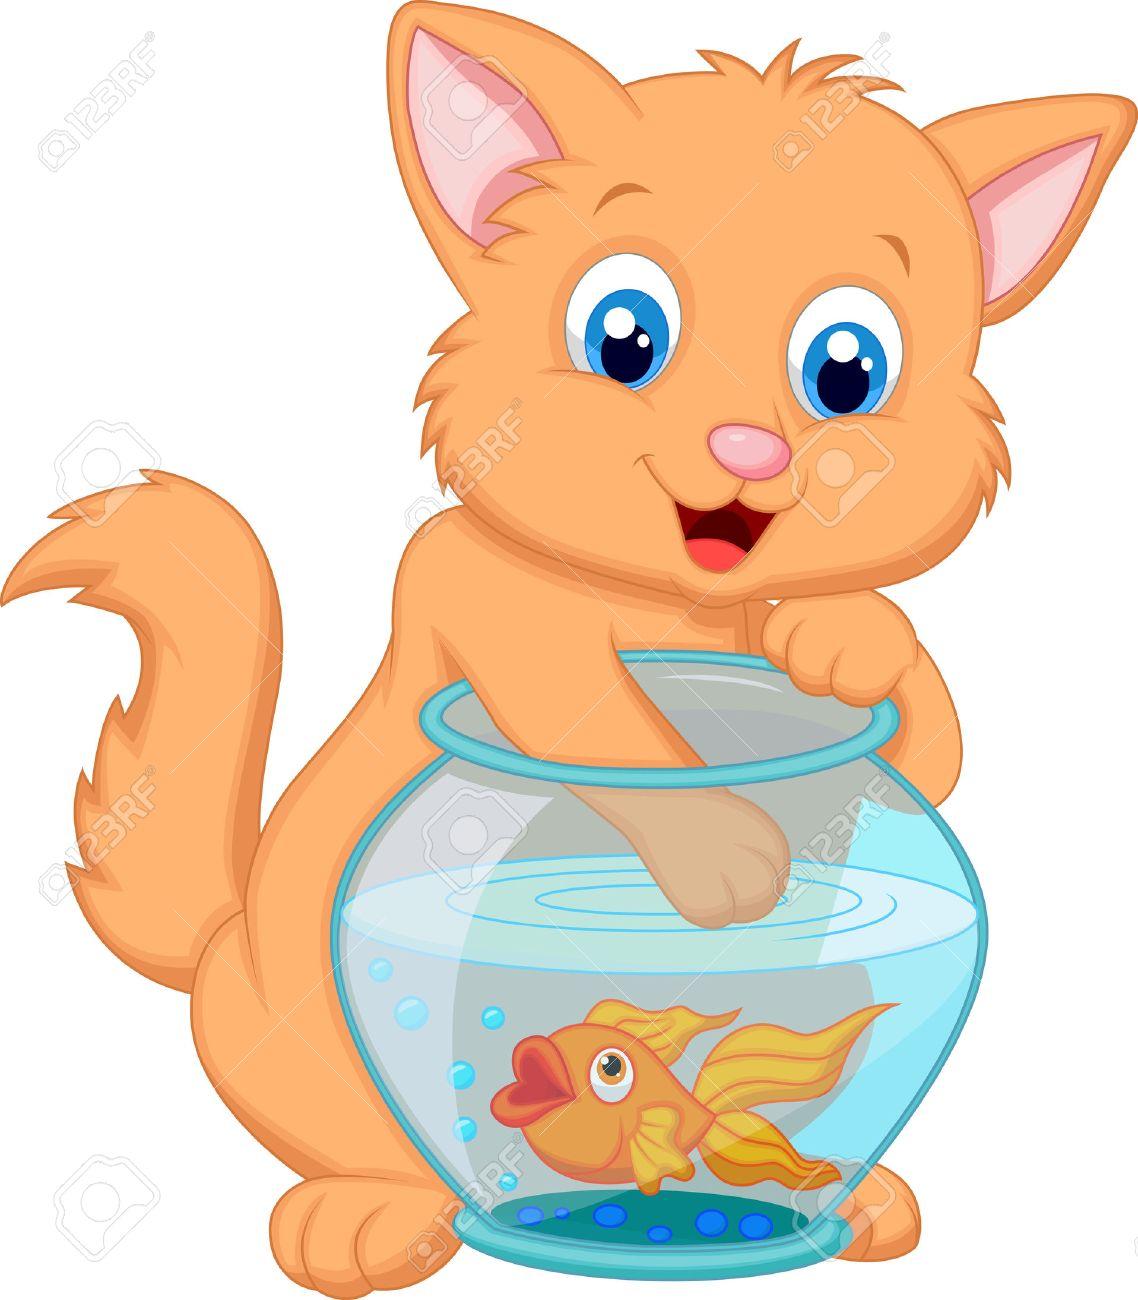 Cartoon Kitten Fishing for Gold Fish in an Aquarium Bowl Stock Vector - 22731611